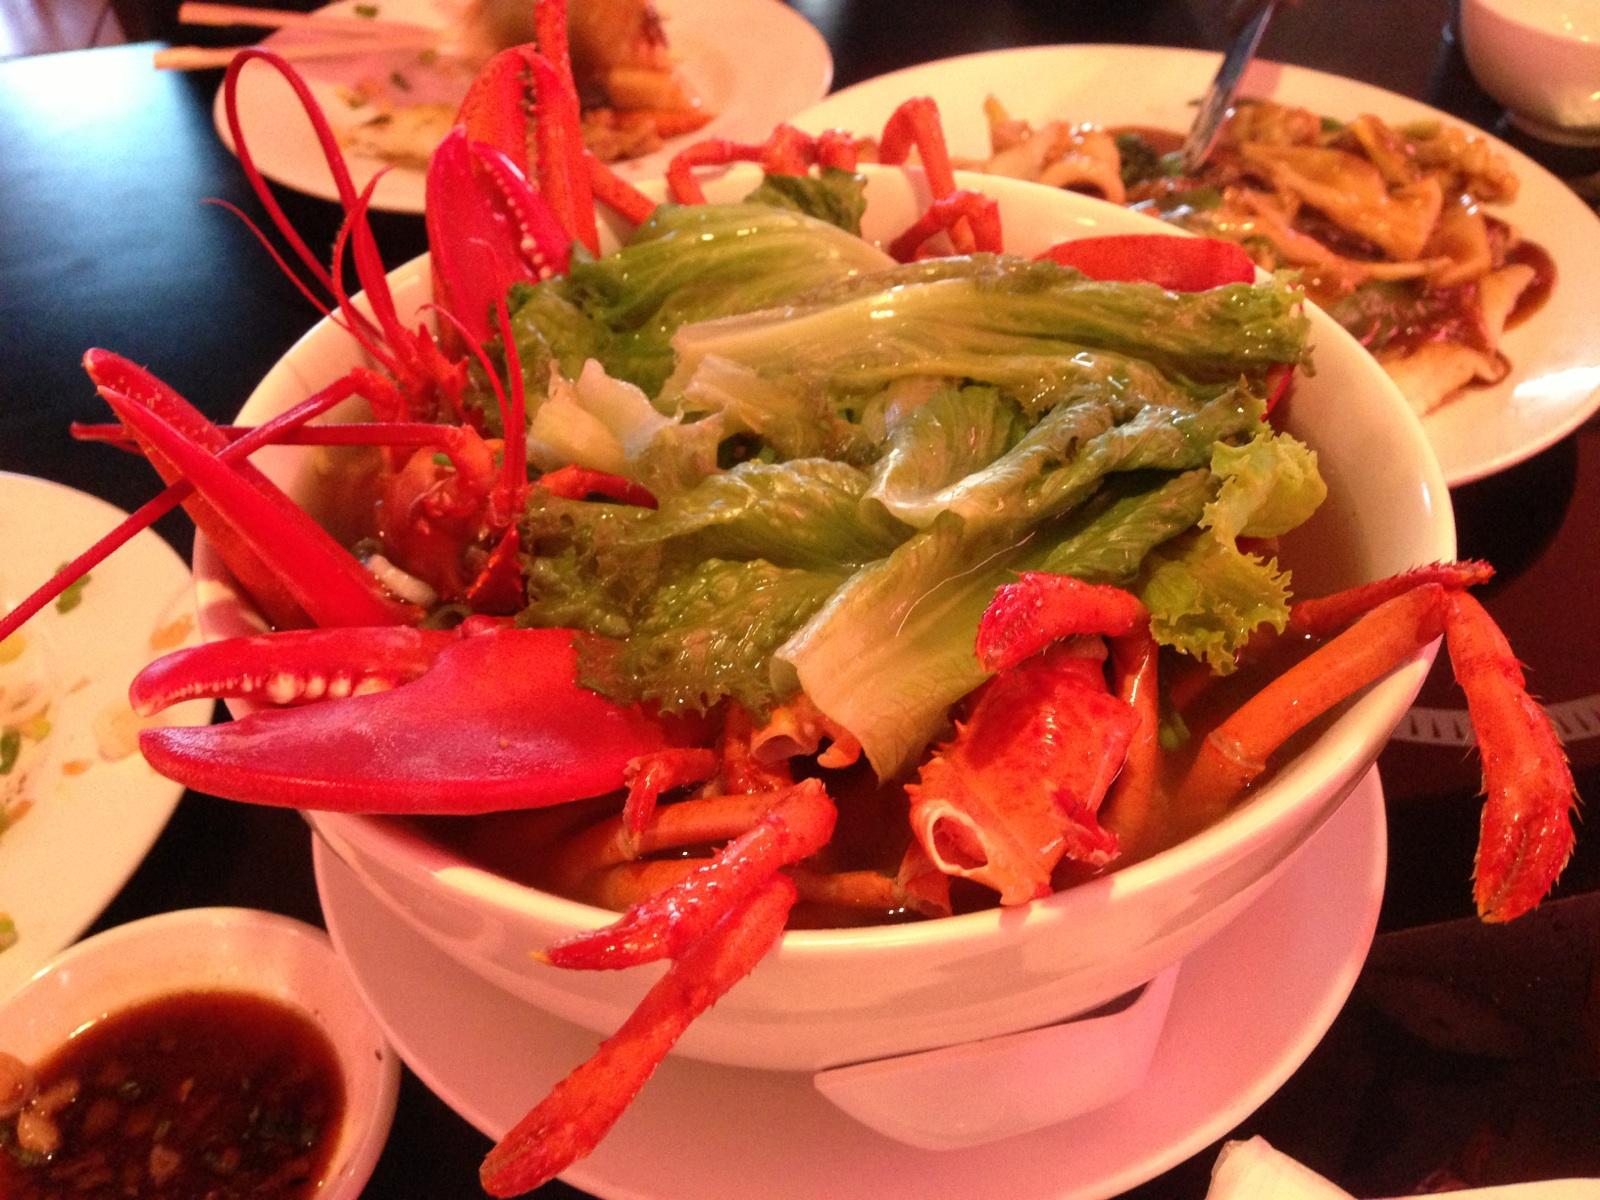 Lobster Soup from Tan Tan in Houston, TX